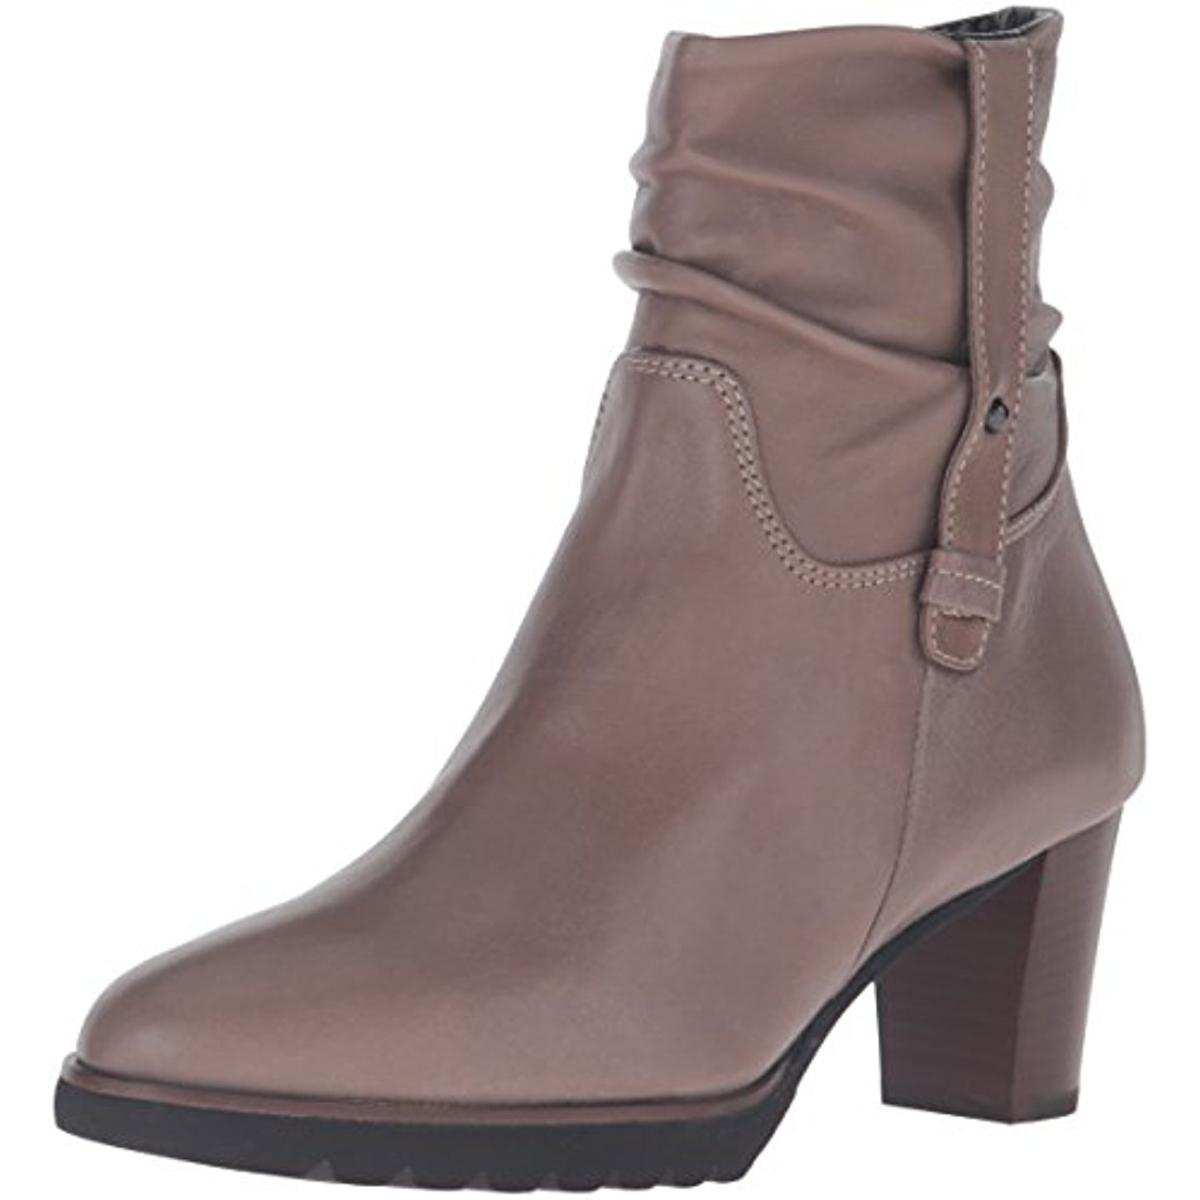 Amalfi by Rangoni Womens Fulvia Slouchy Almond Toe Ankle Boots by Amalfi by Rangoni